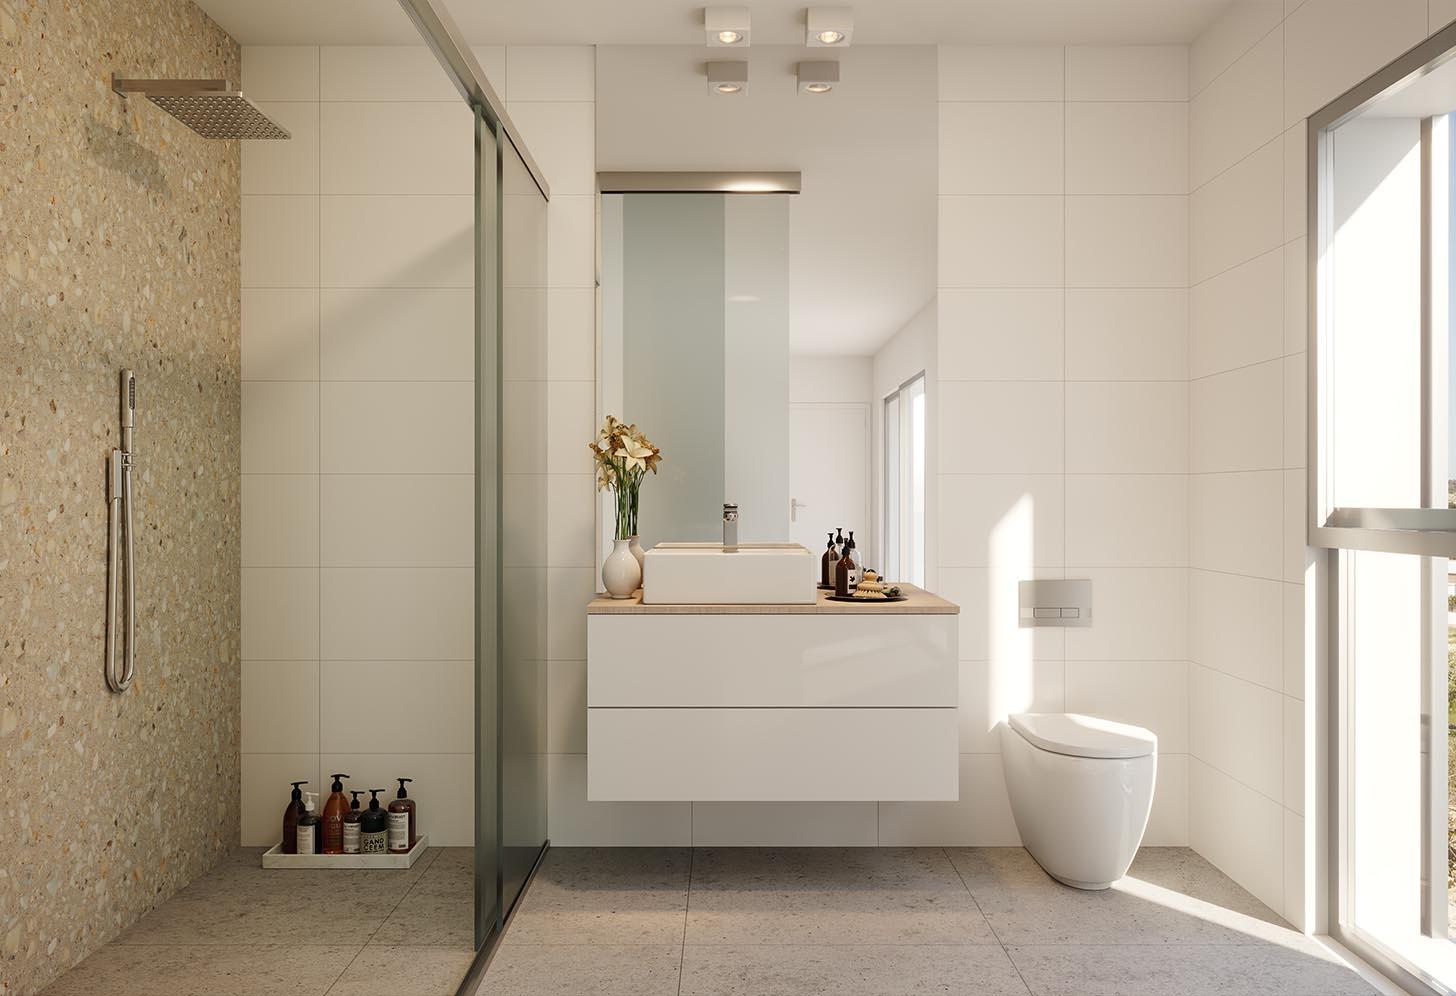 Salle de bain de la villa de luxe à Algorfa